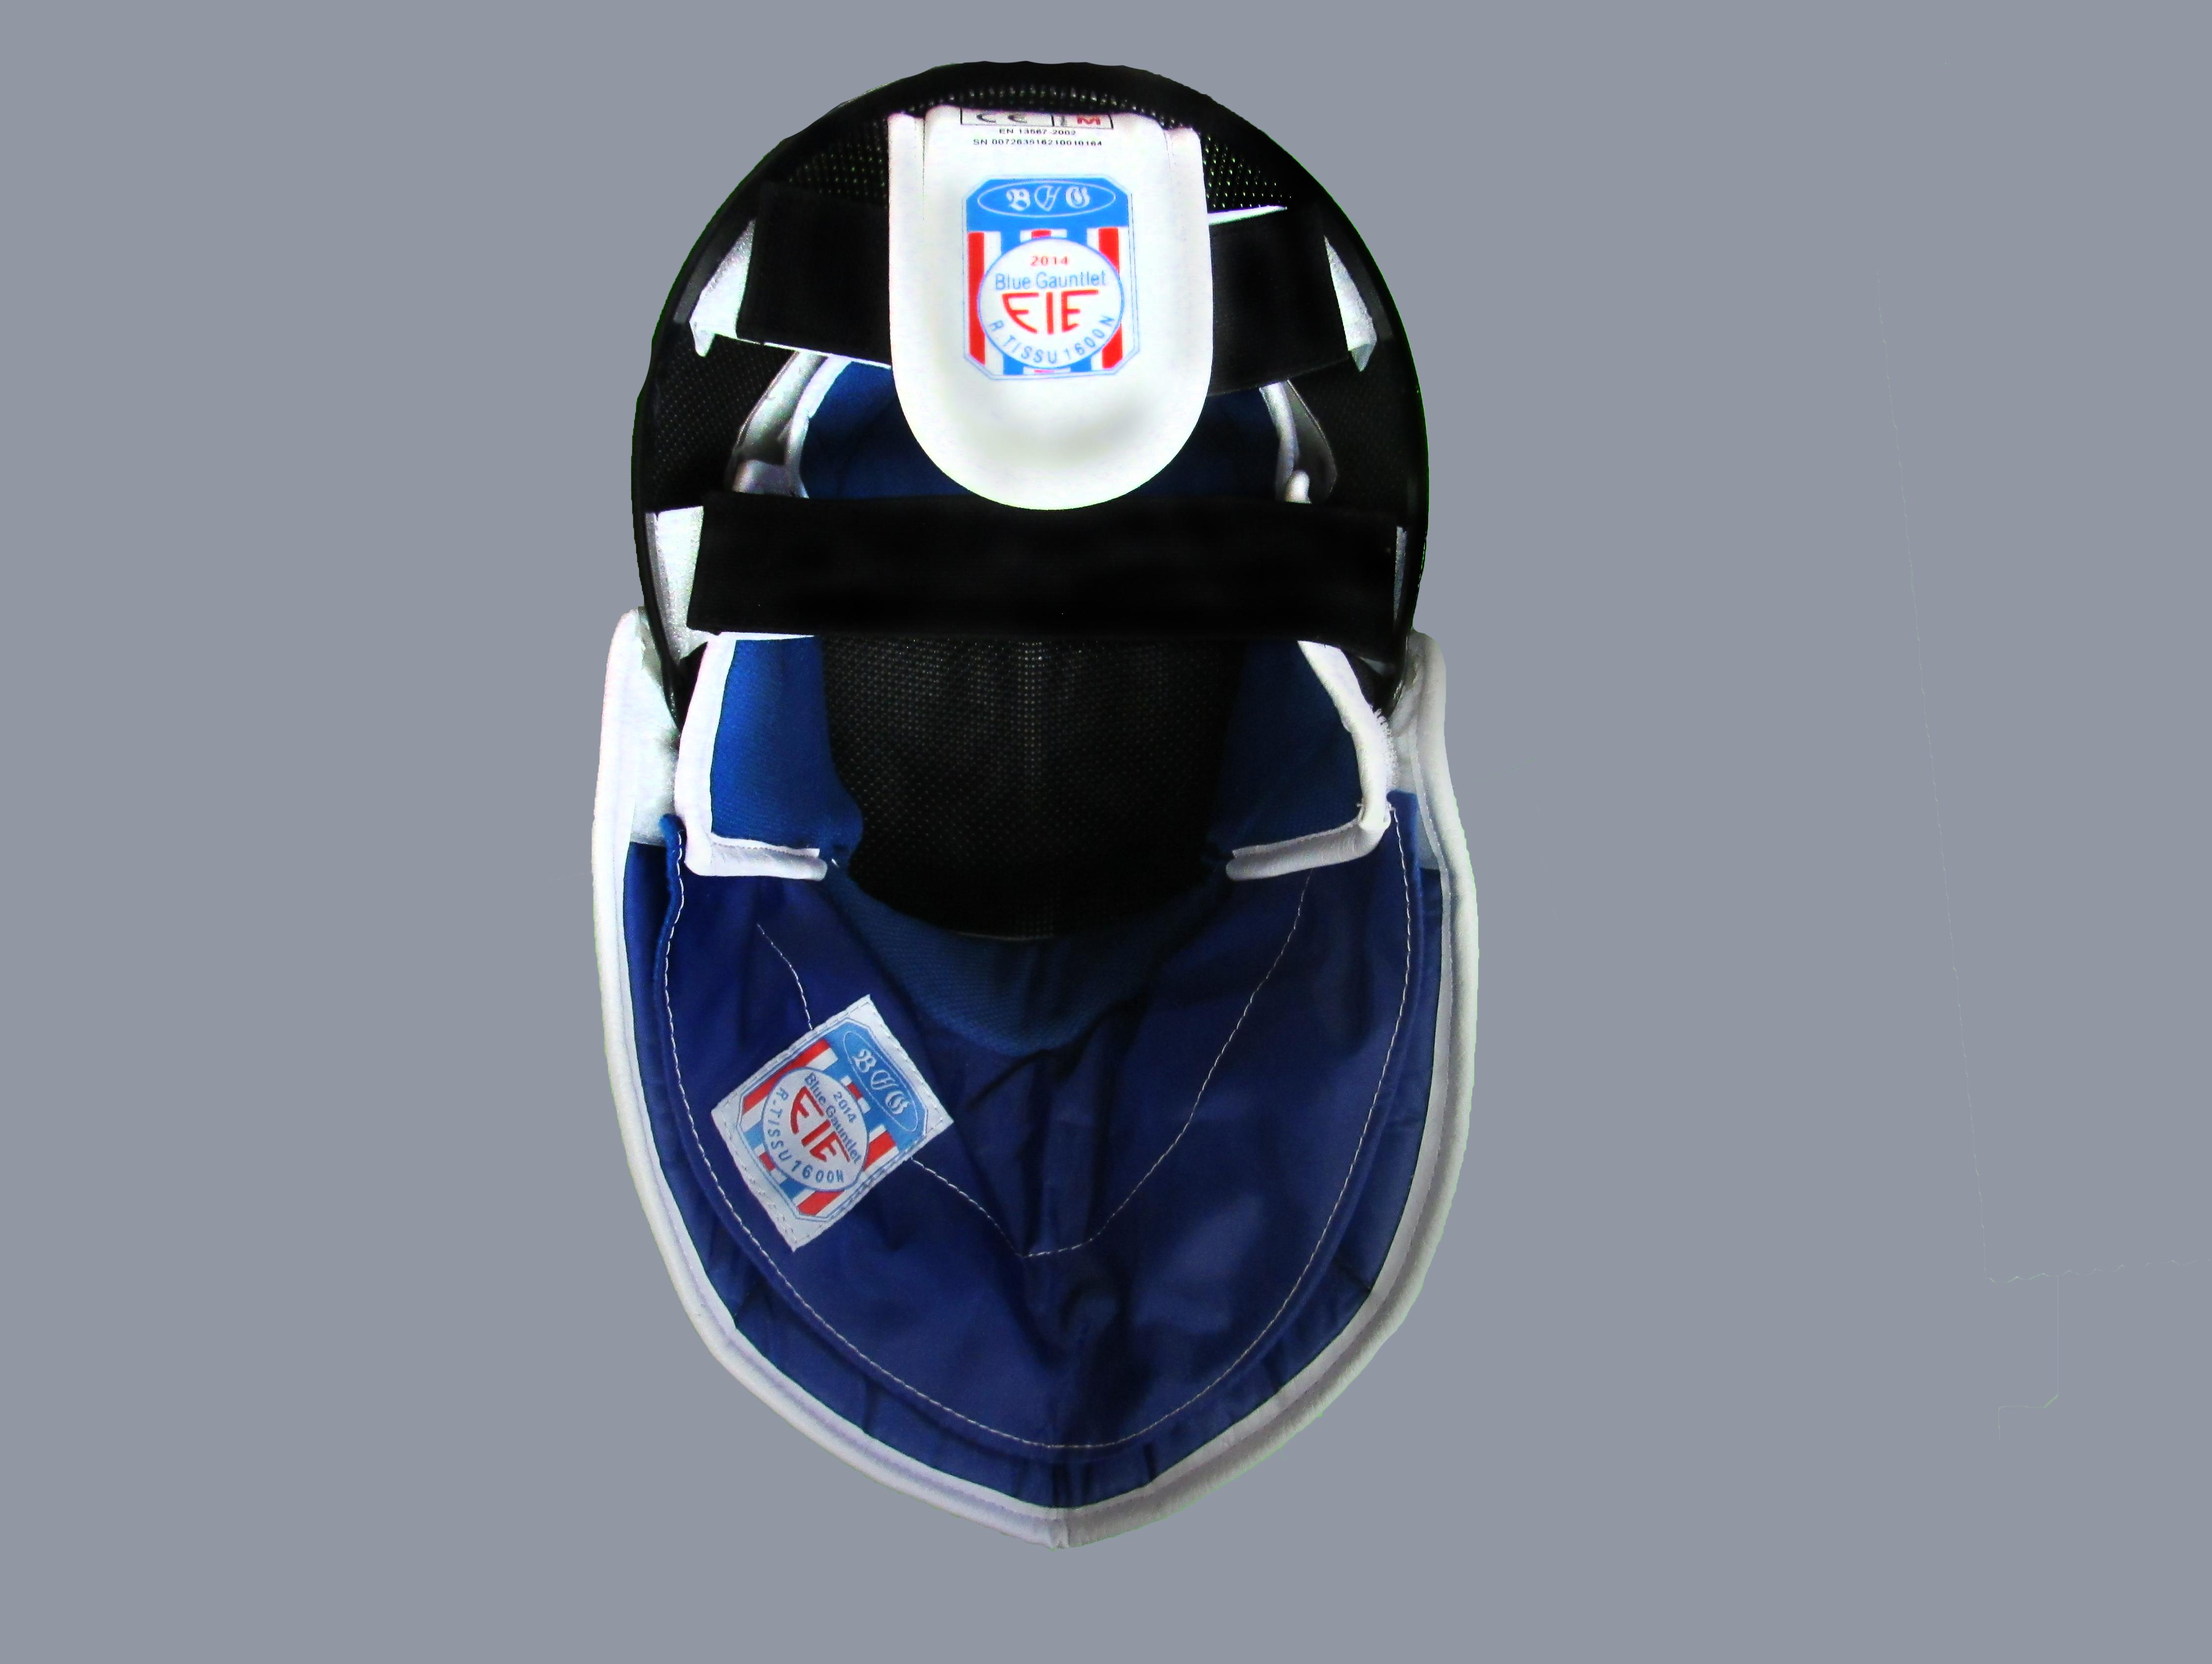 BG 1600N epee FIE fencing MASK